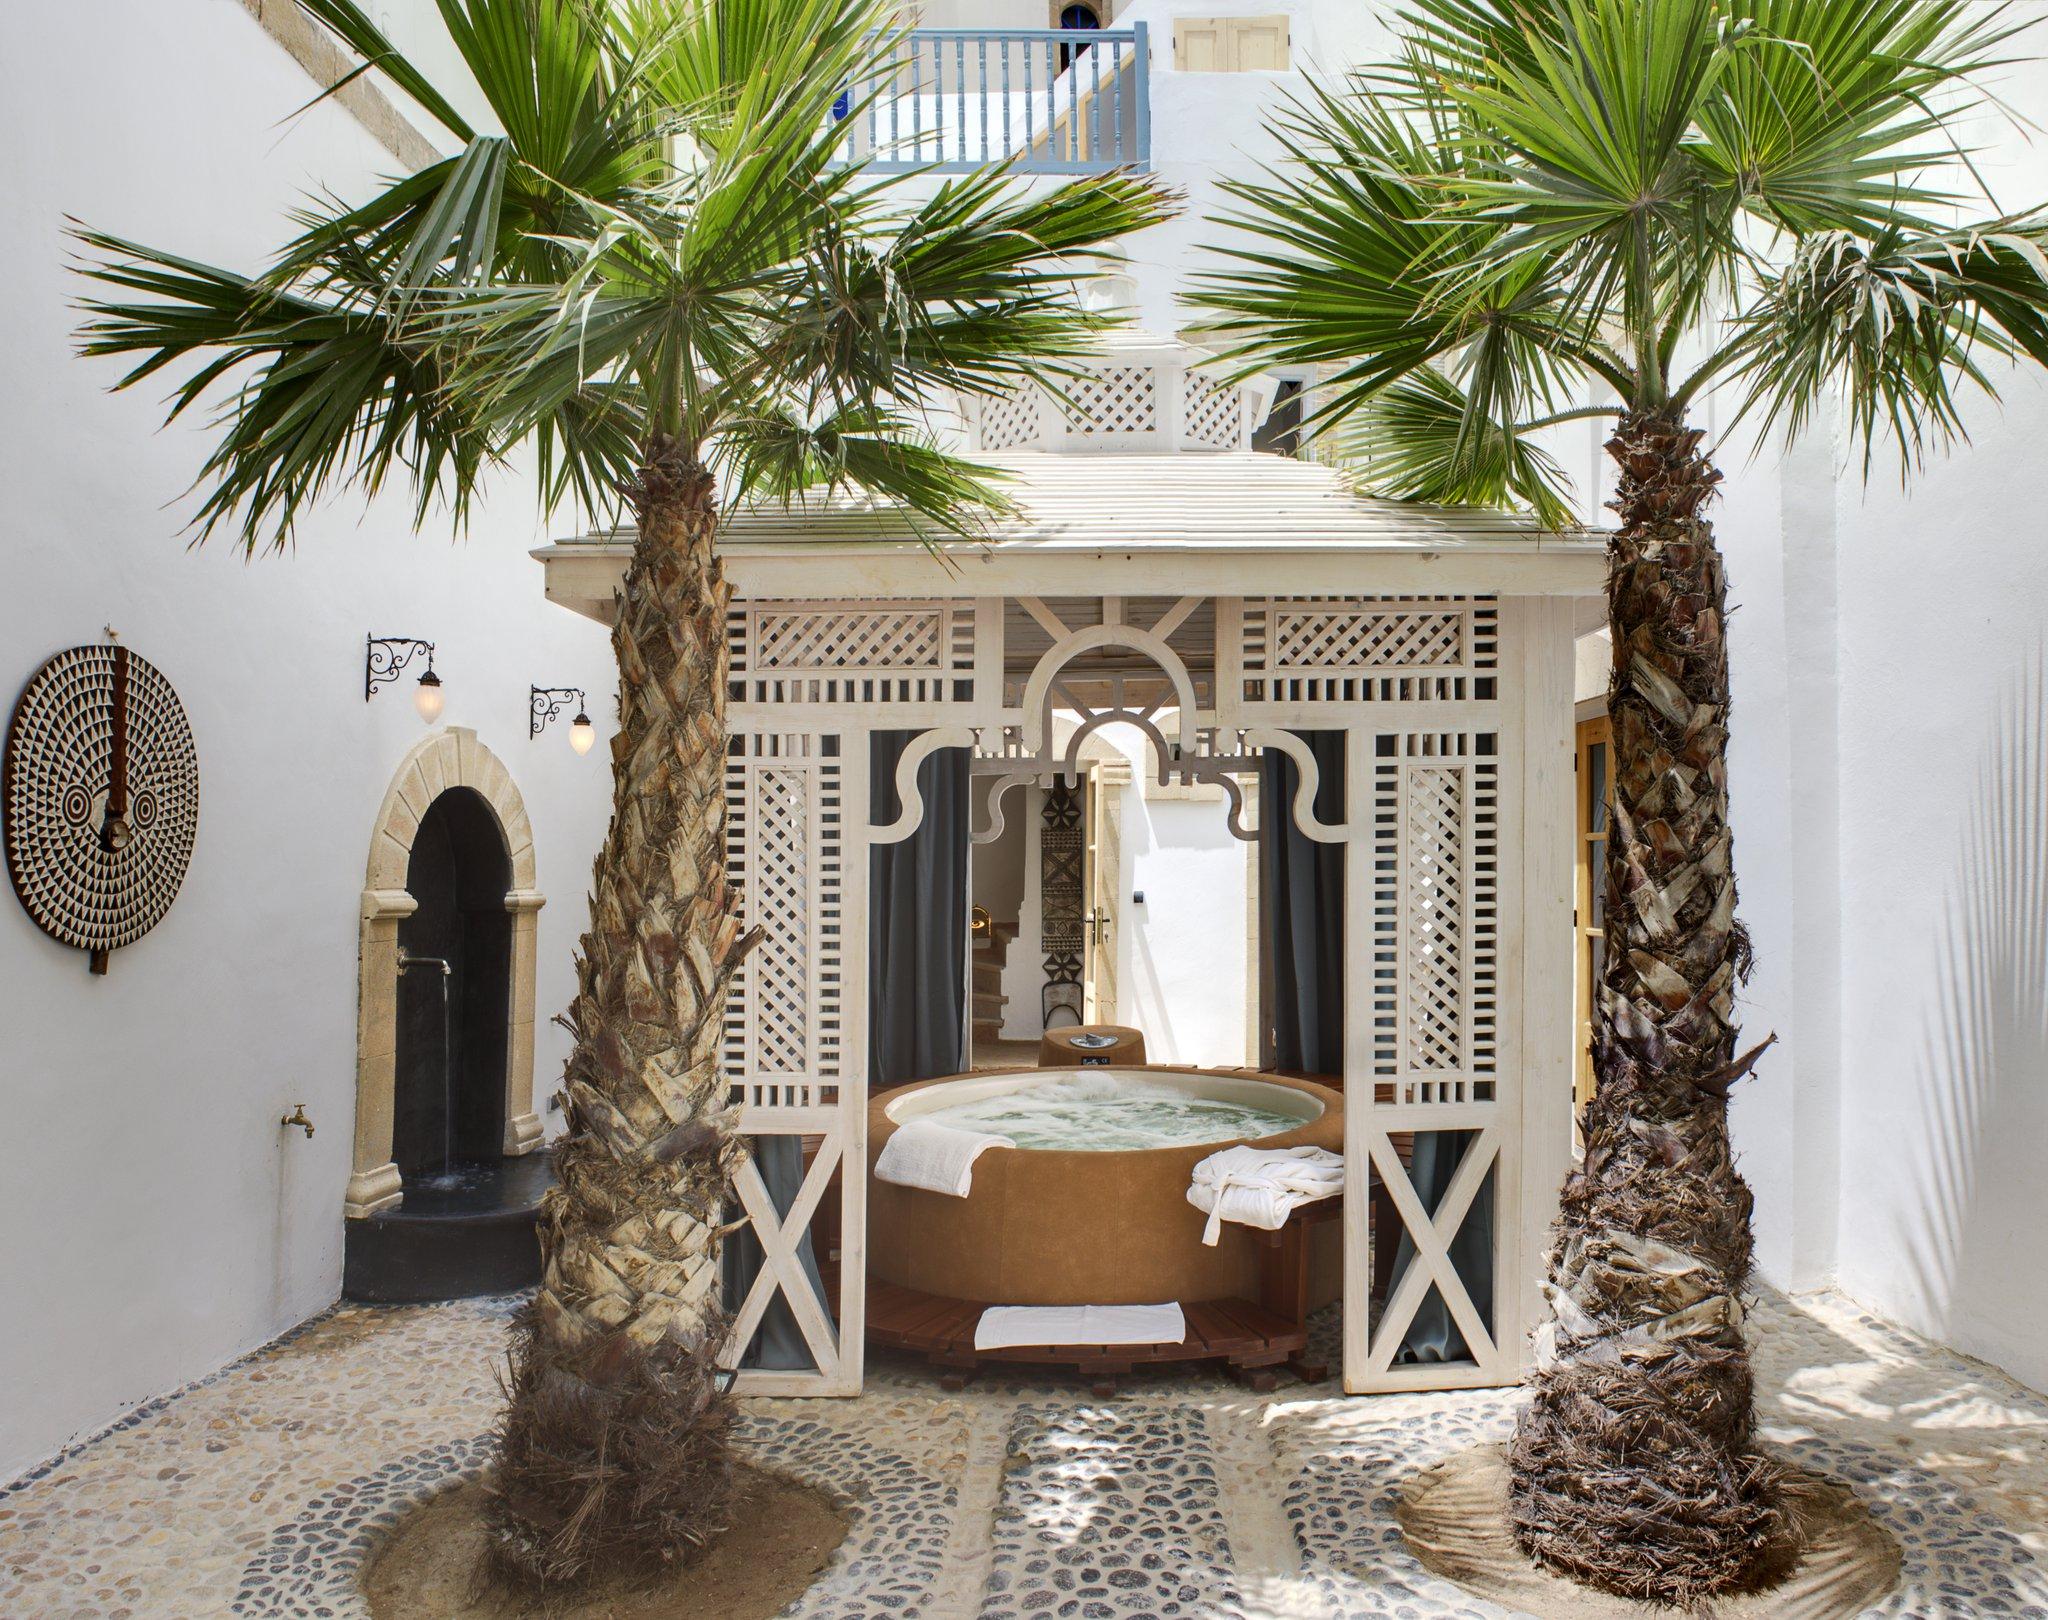 D U00e9couvrez Le Jacuzzi De Riad Baladin  U00e0 Essaouira